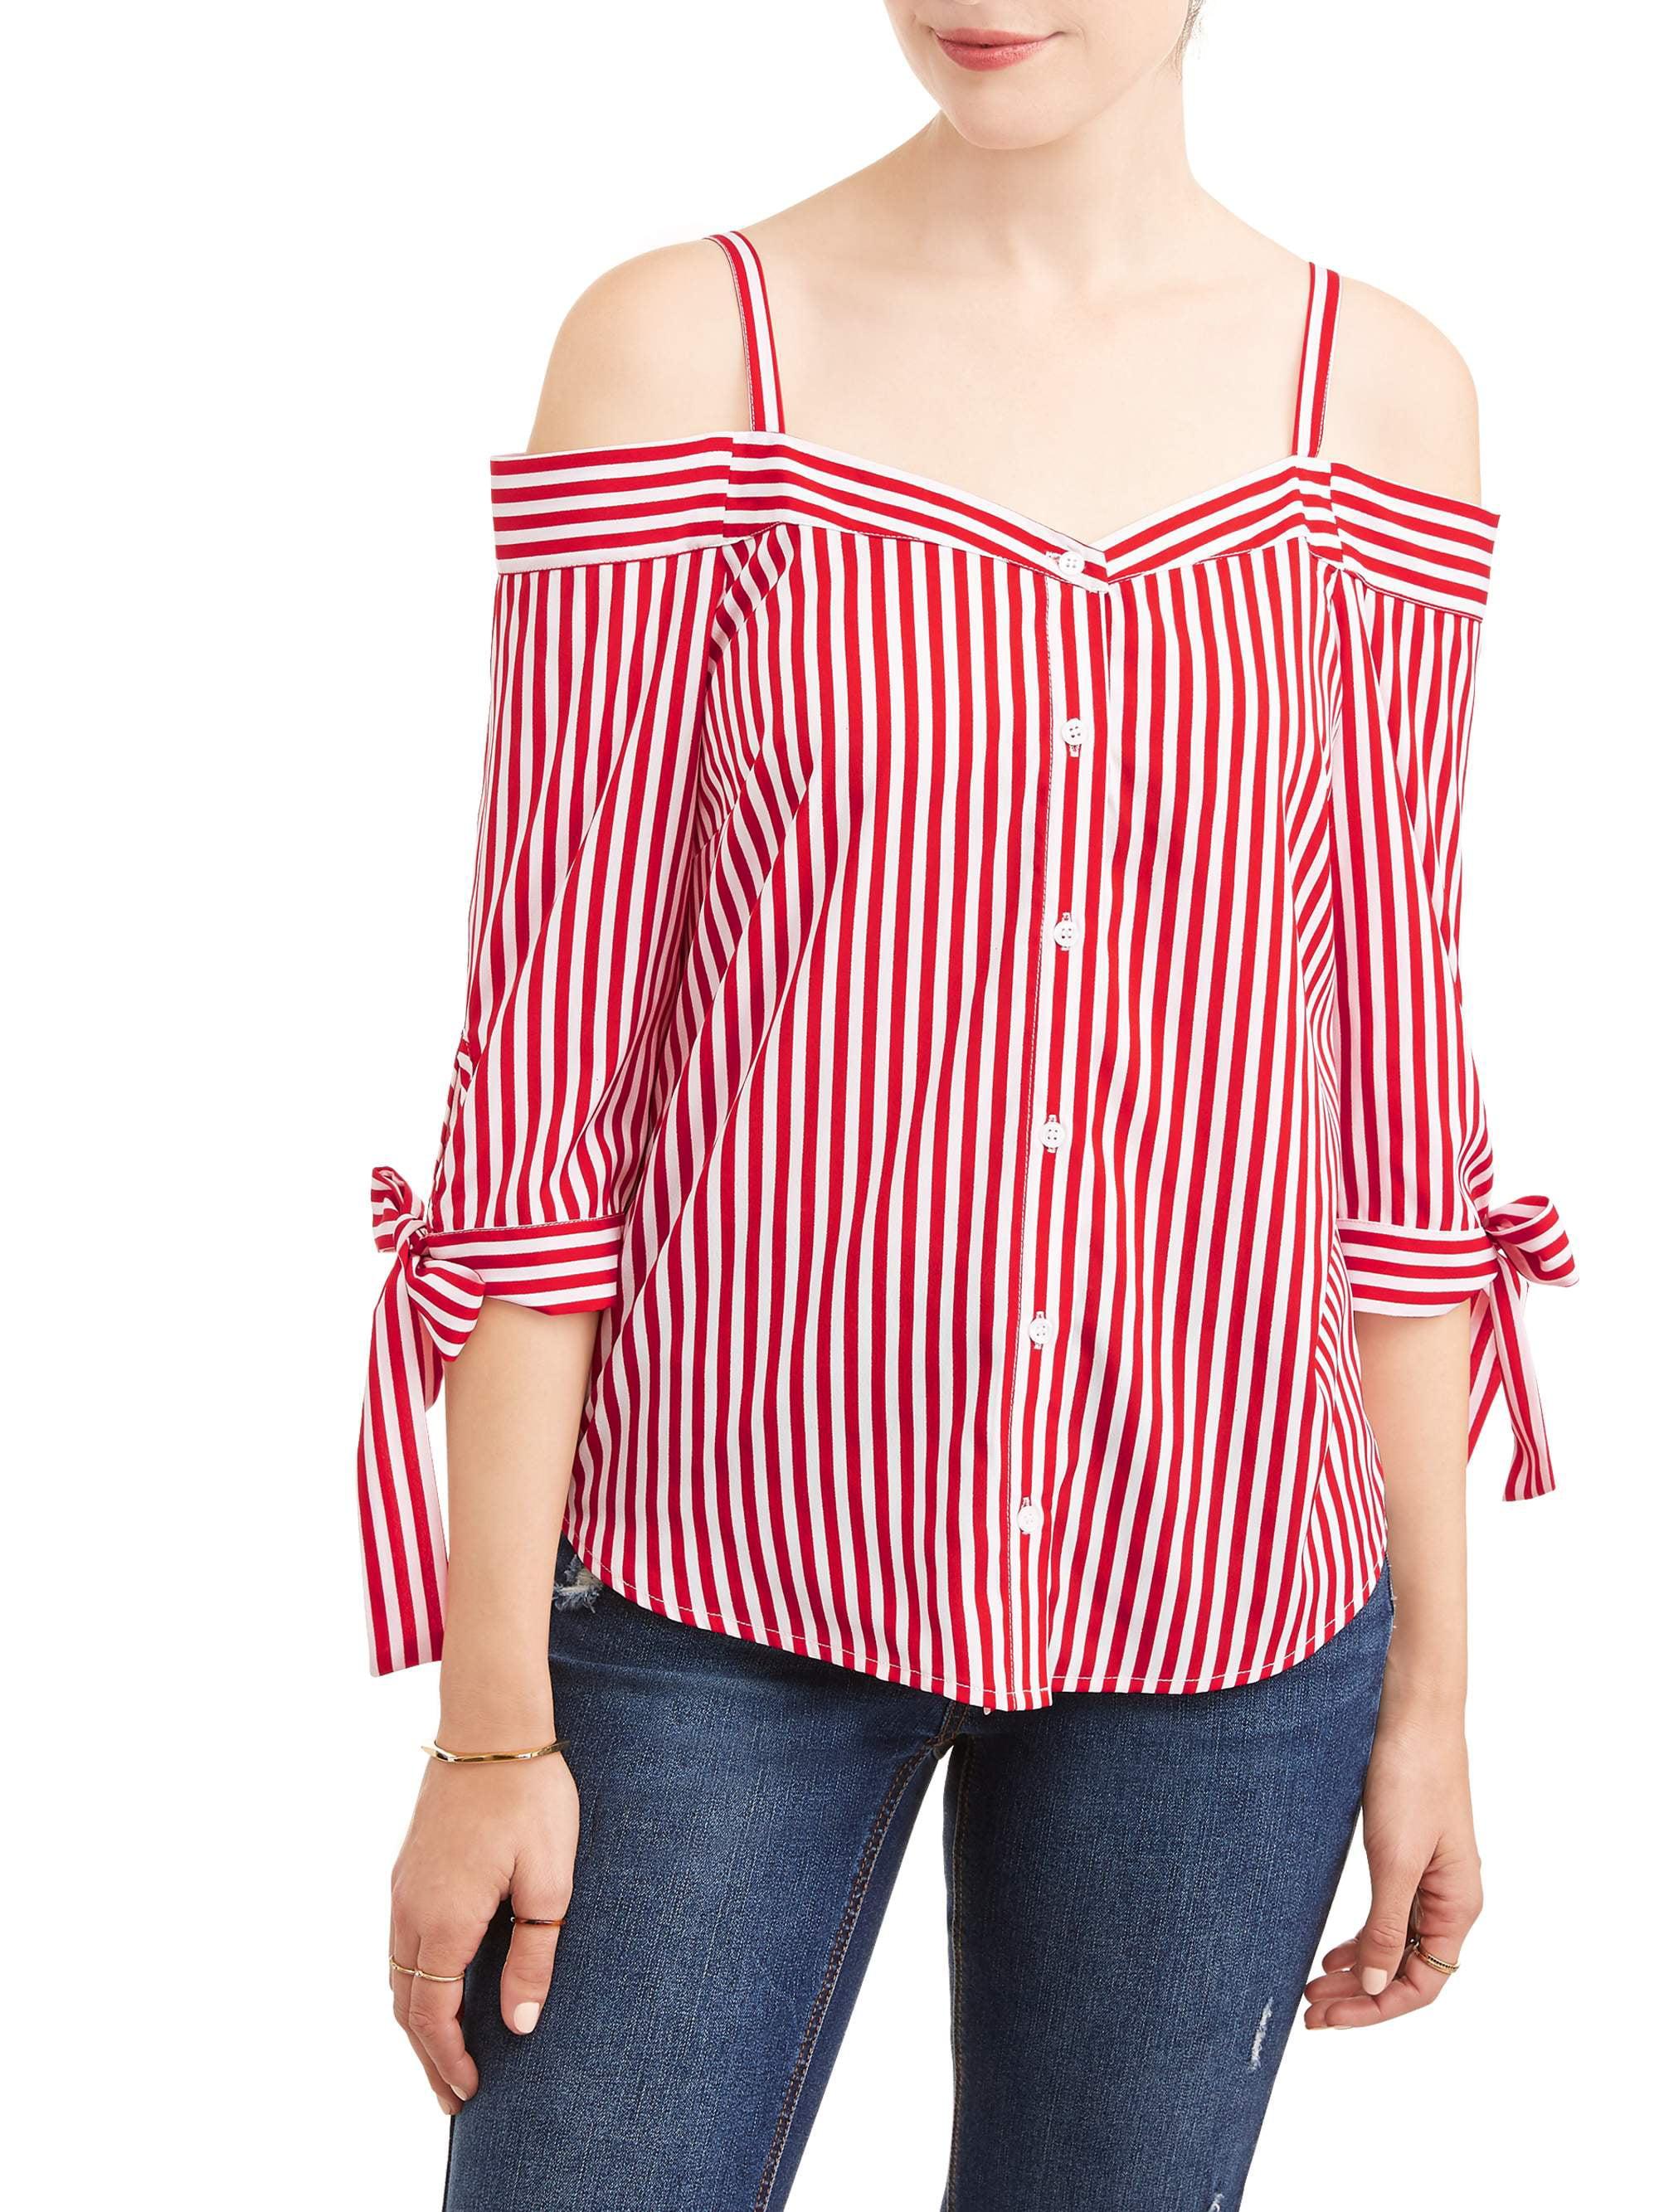 b1c5a46bfacc36 MILLENIUM - Women's Stripe Off the Shoulder Tie Sleeve Top - Walmart.com